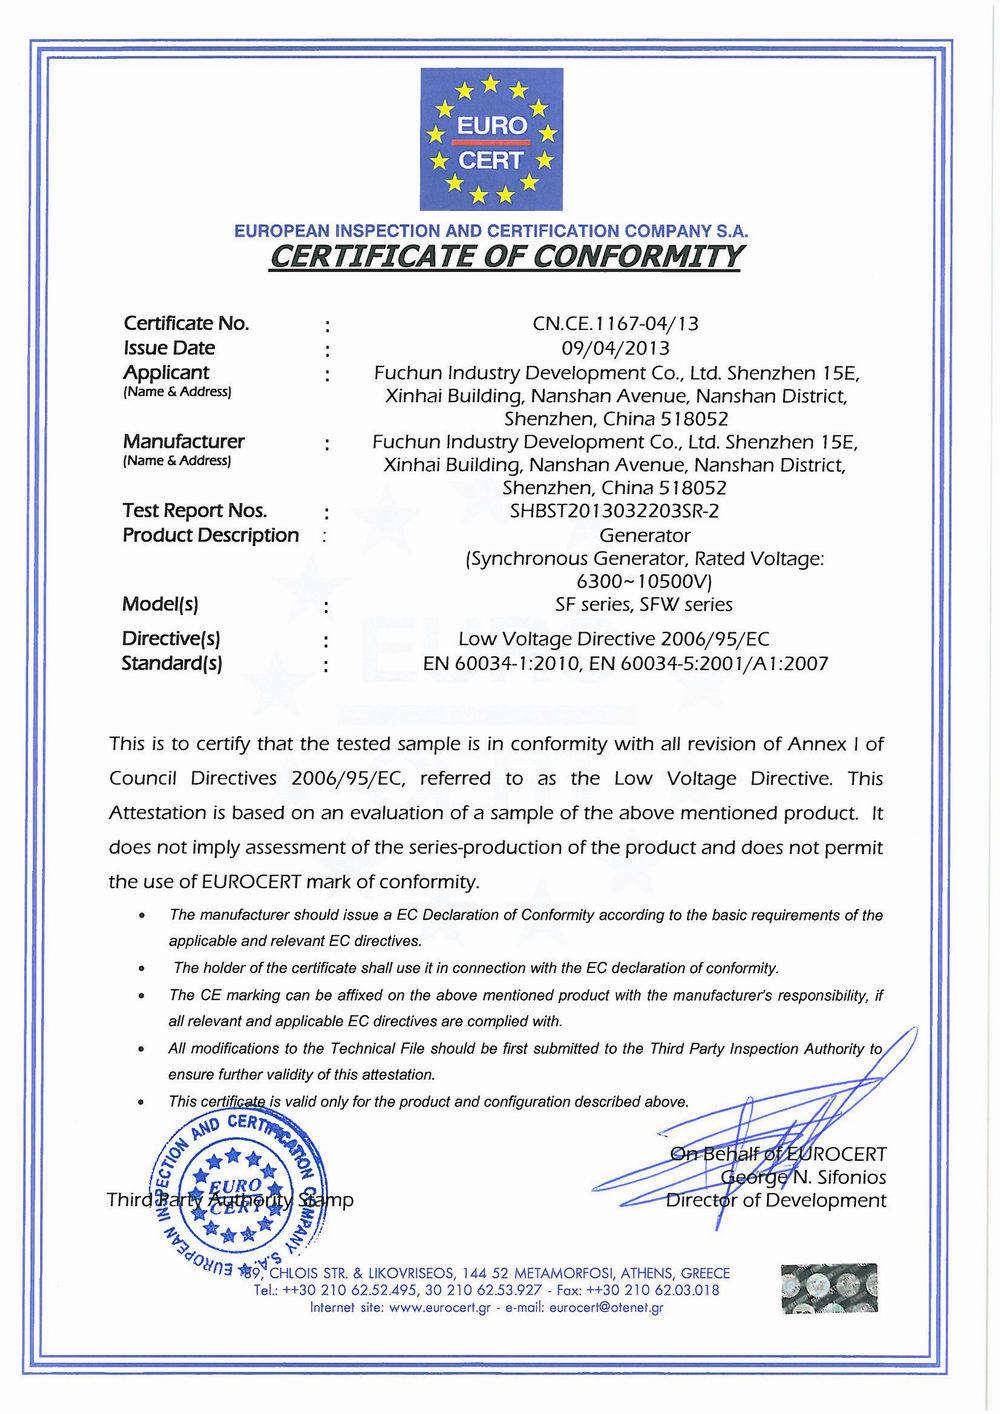 Ce Certification Of High Voltage Generator Fuchun Industry